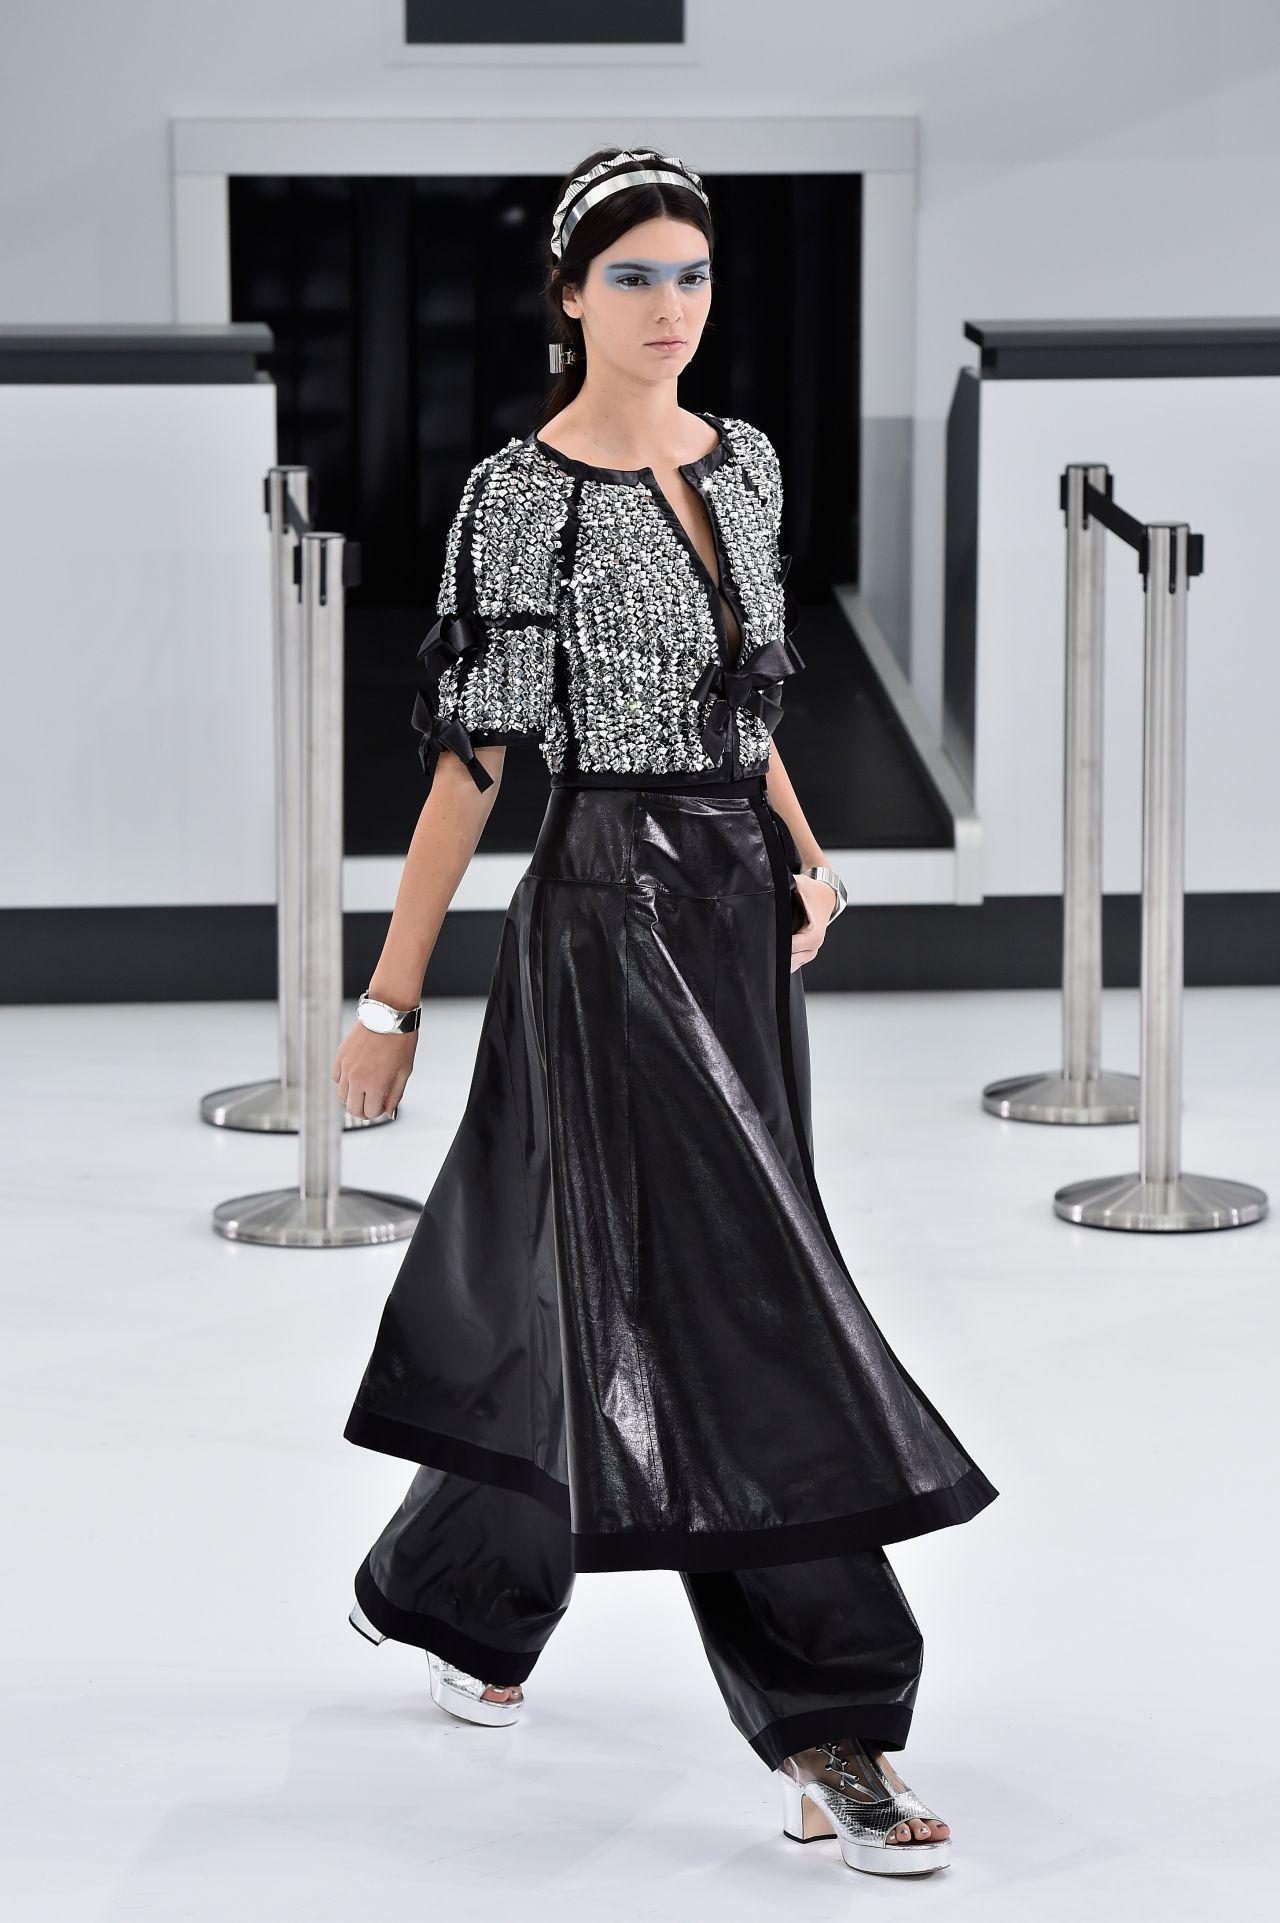 Kendall Jenner Chanel Show Paris Fashion Week